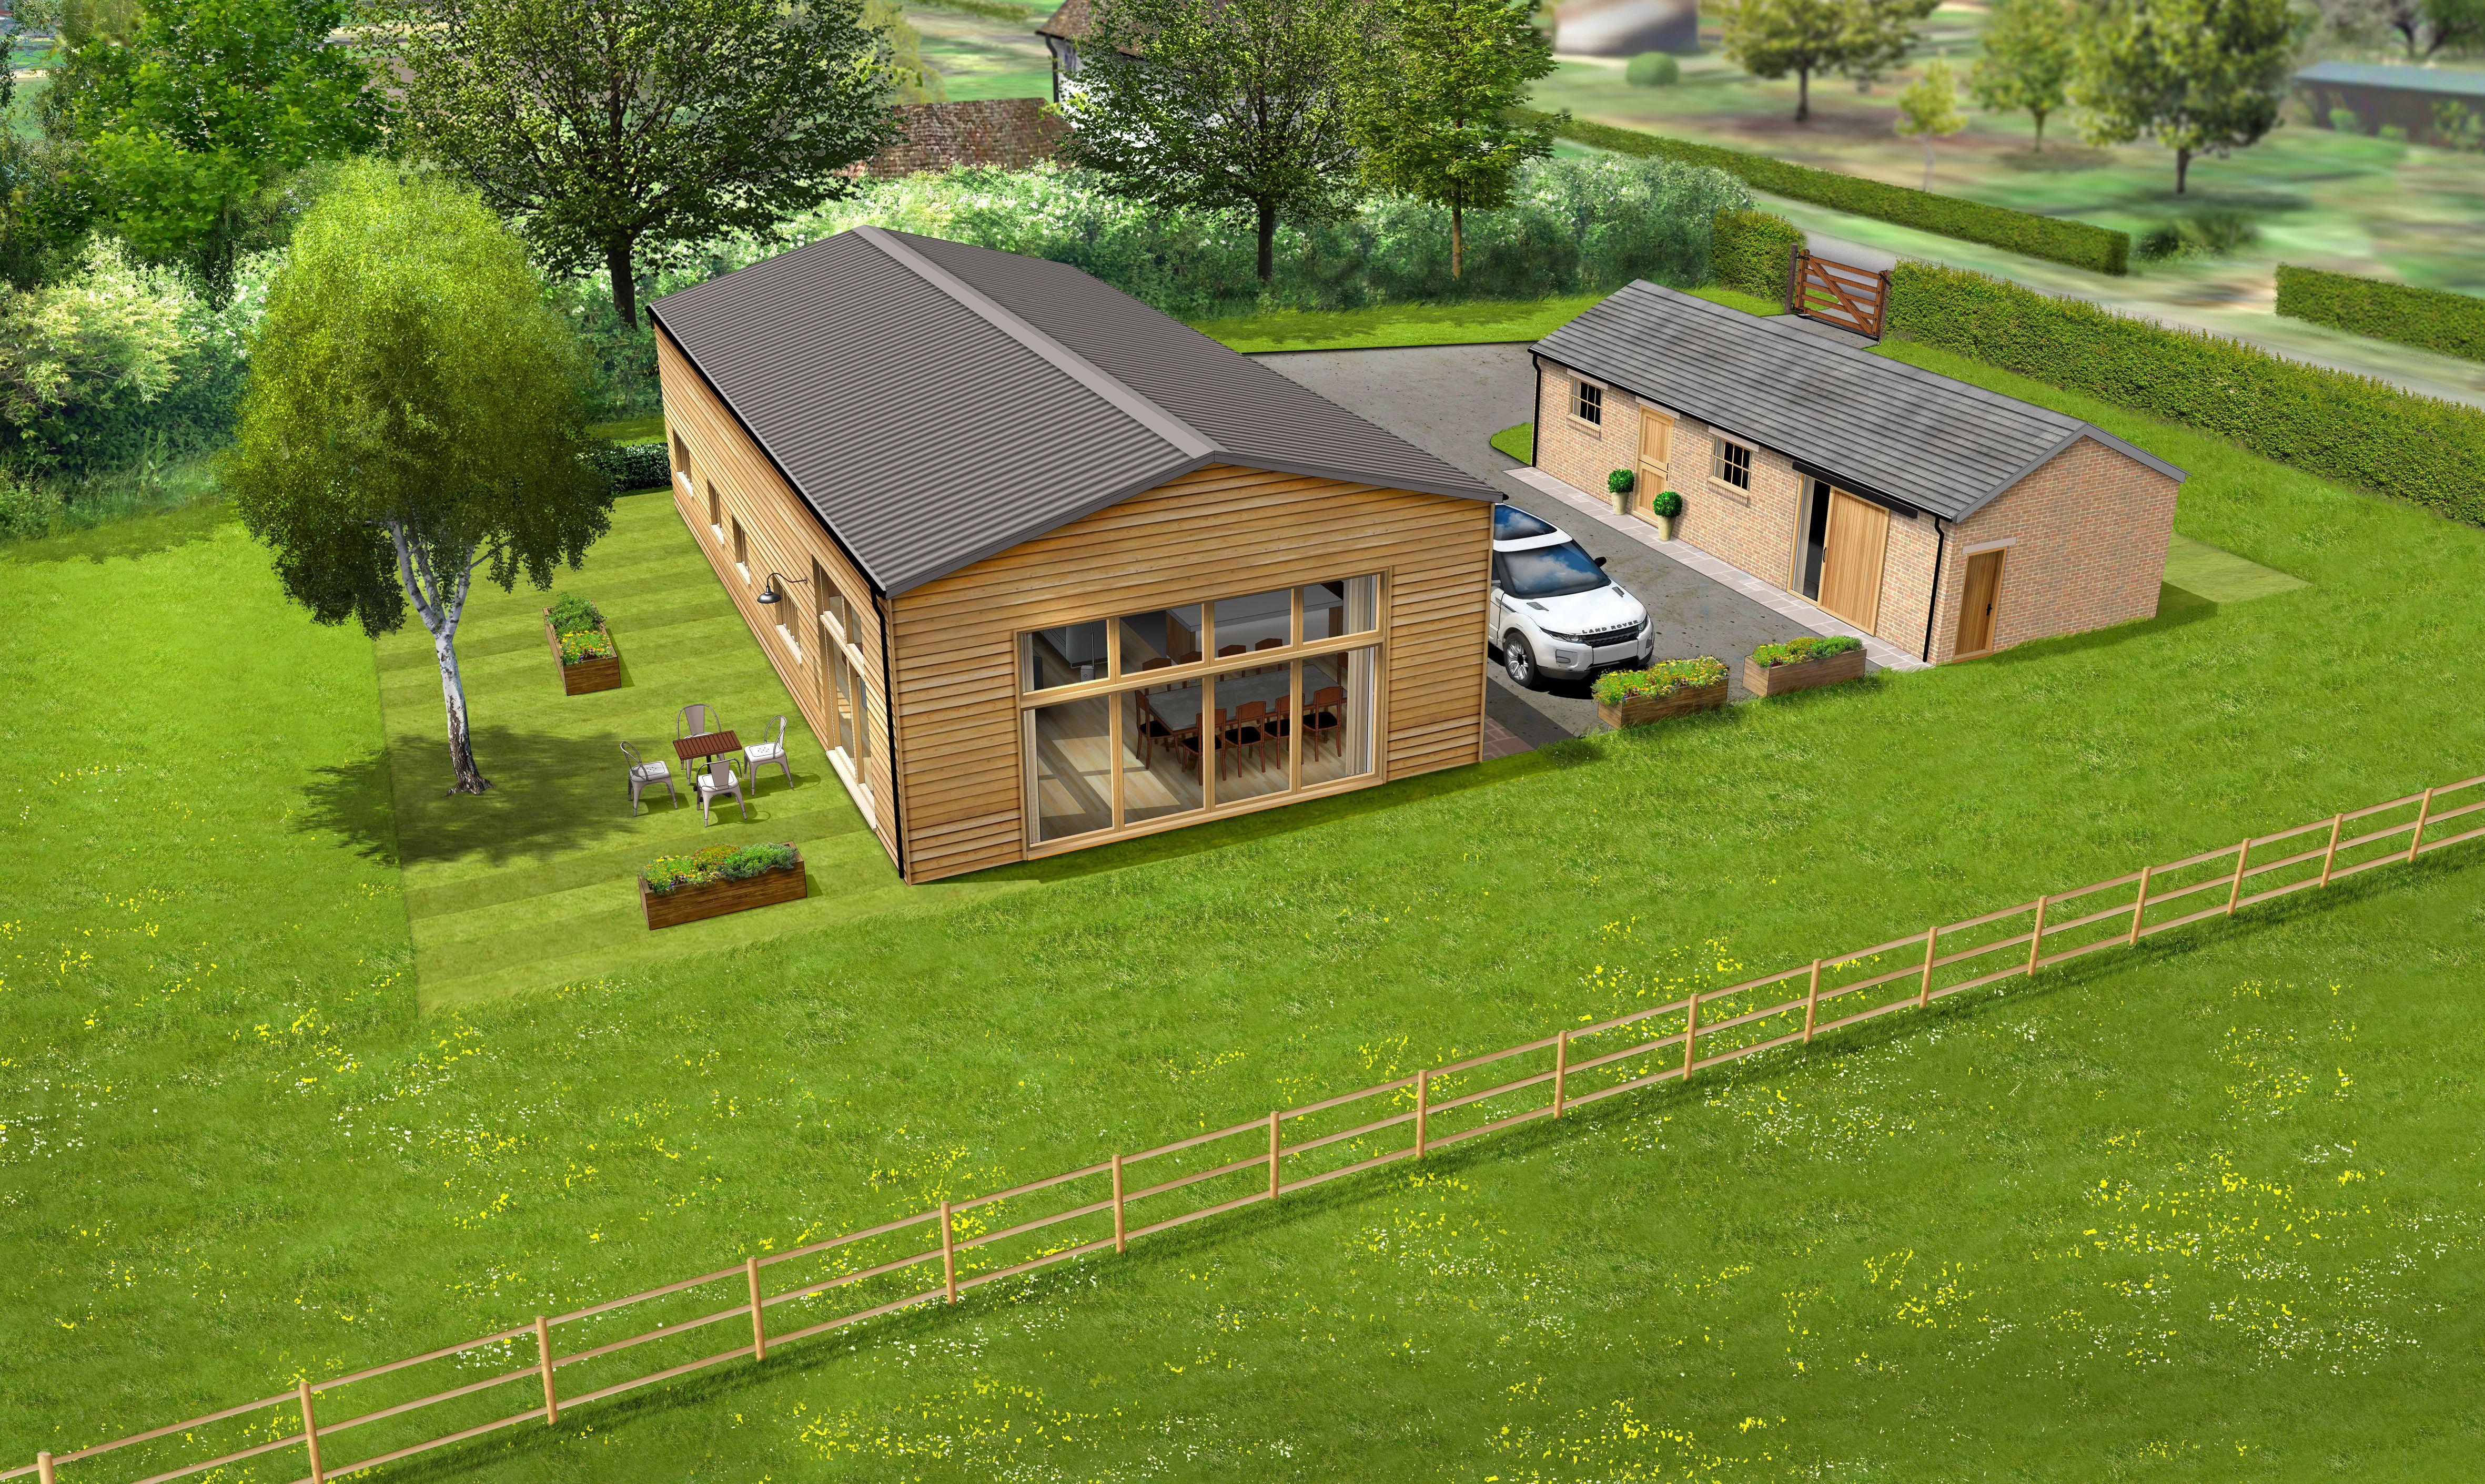 Metal Barn Into Home Conversion